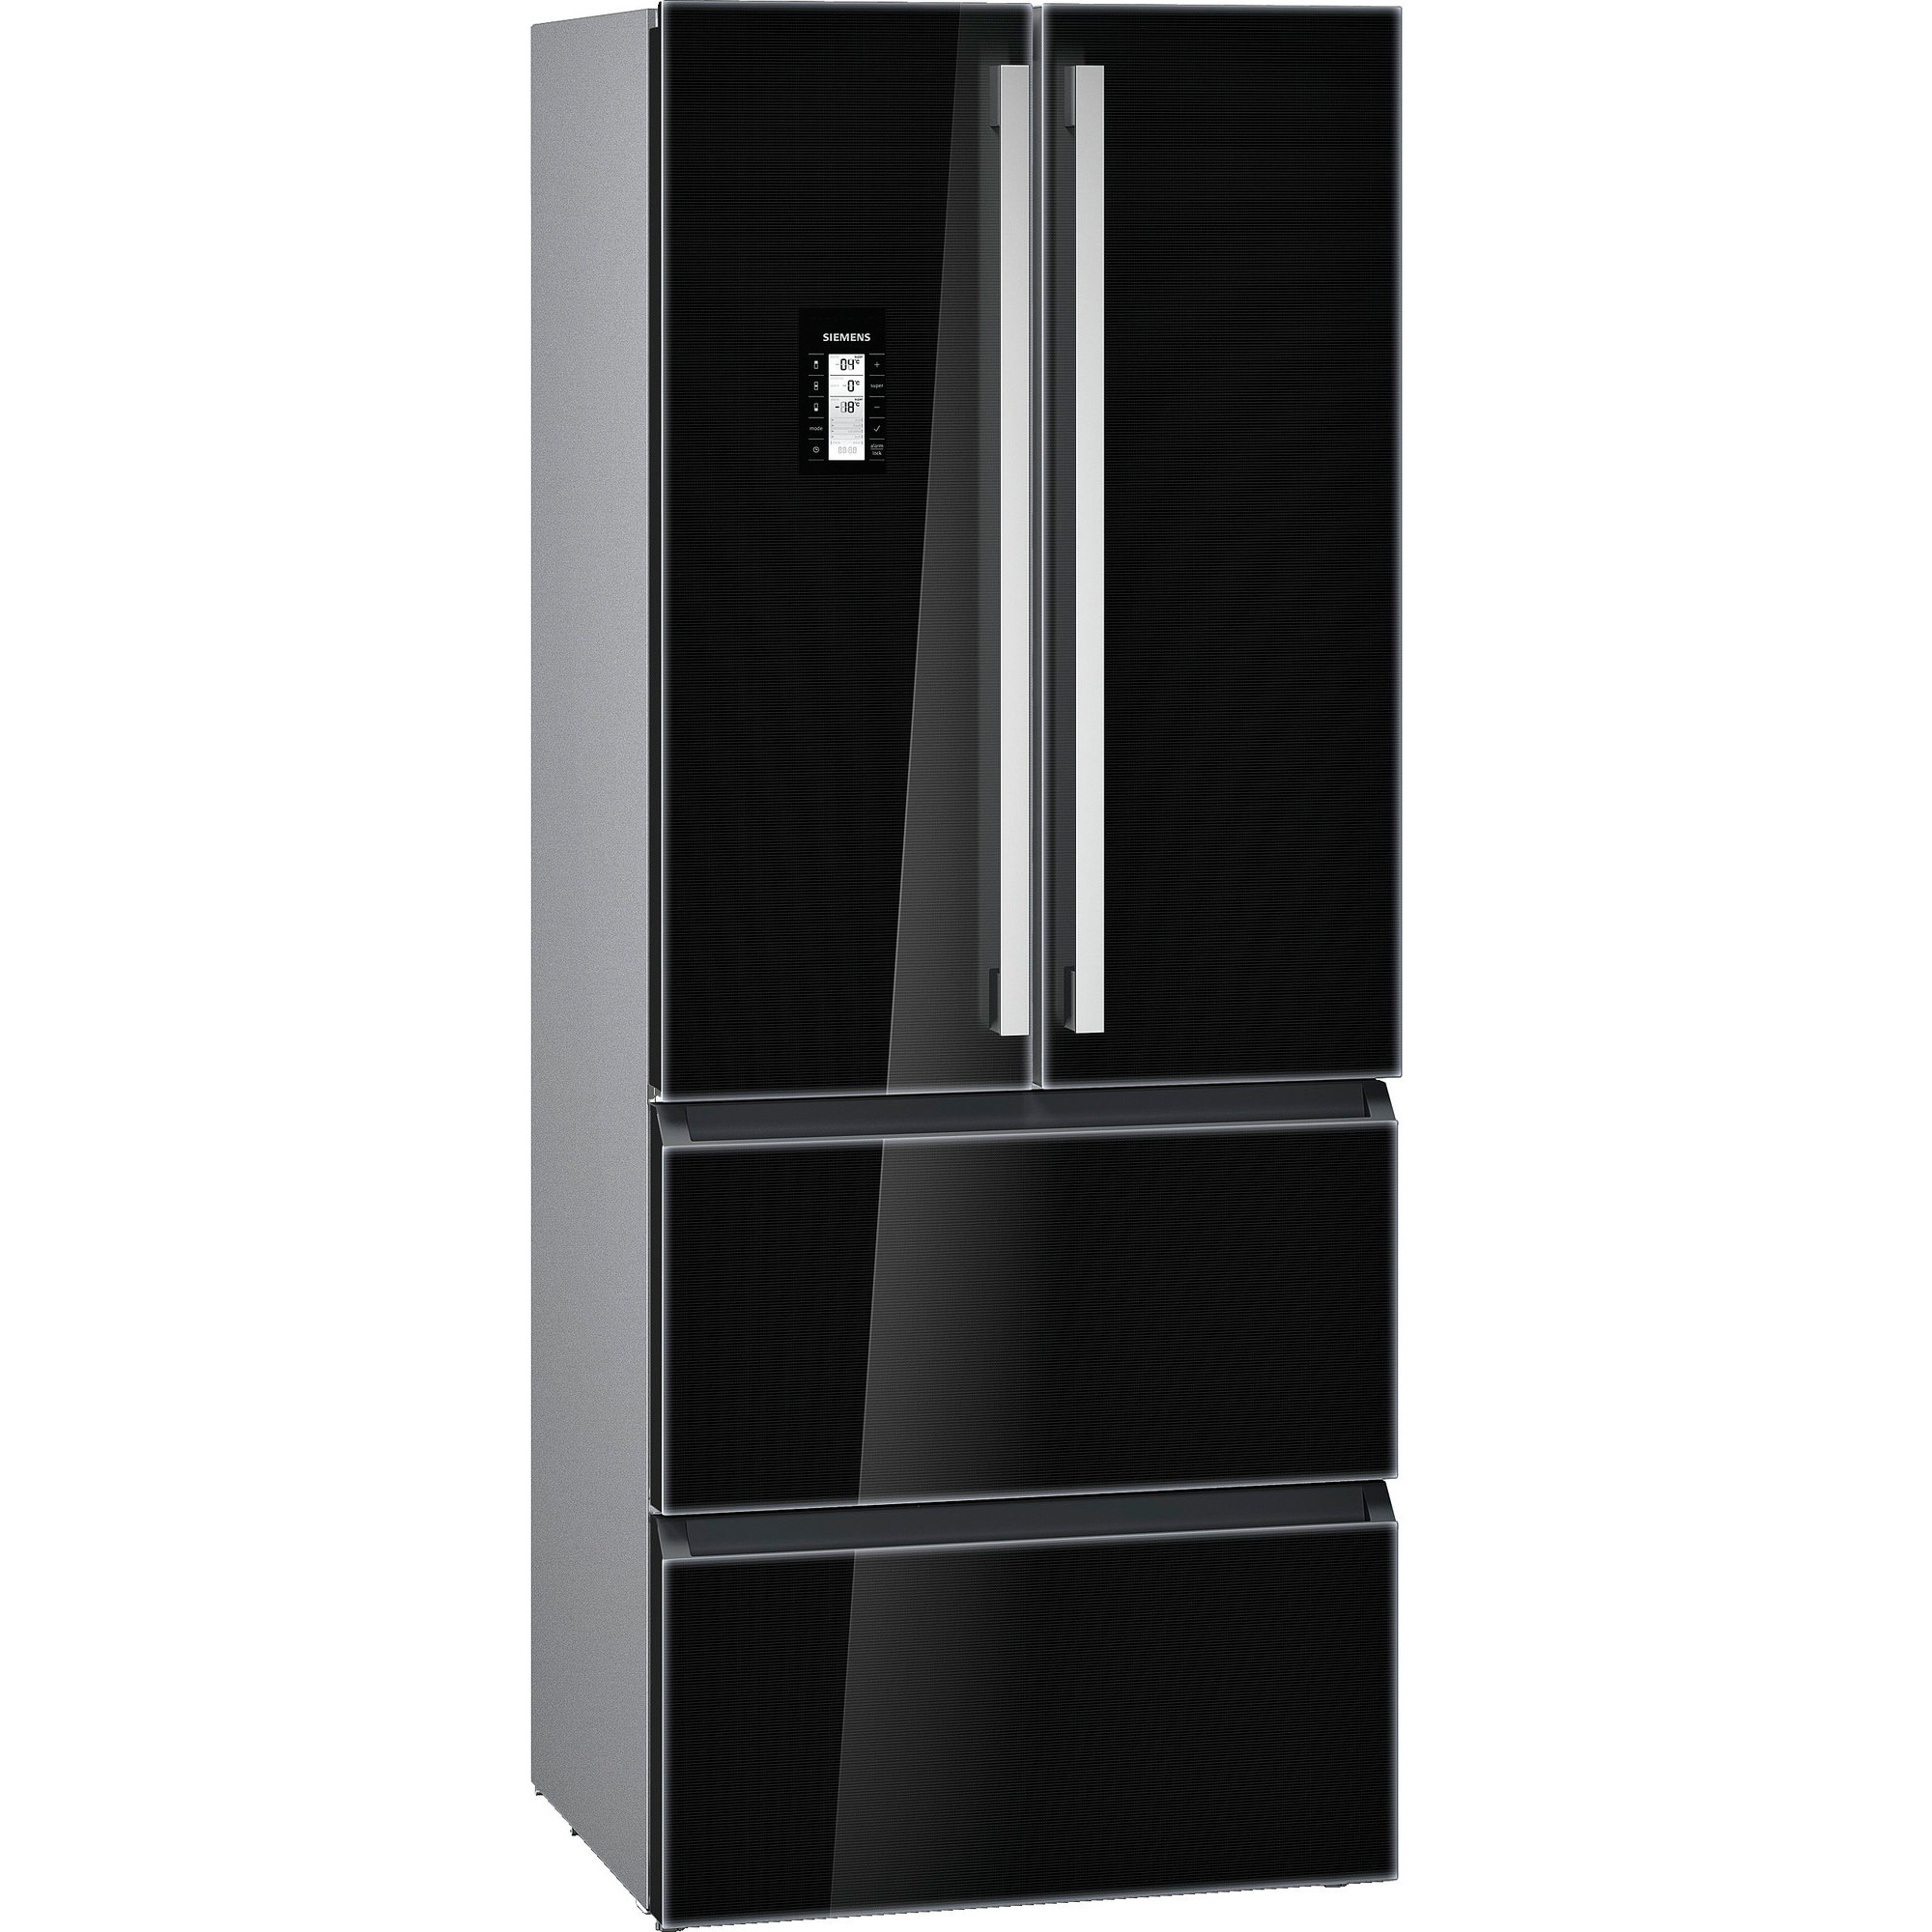 Siemens iQ700 Kylskåp/frys med dubbeldörrar